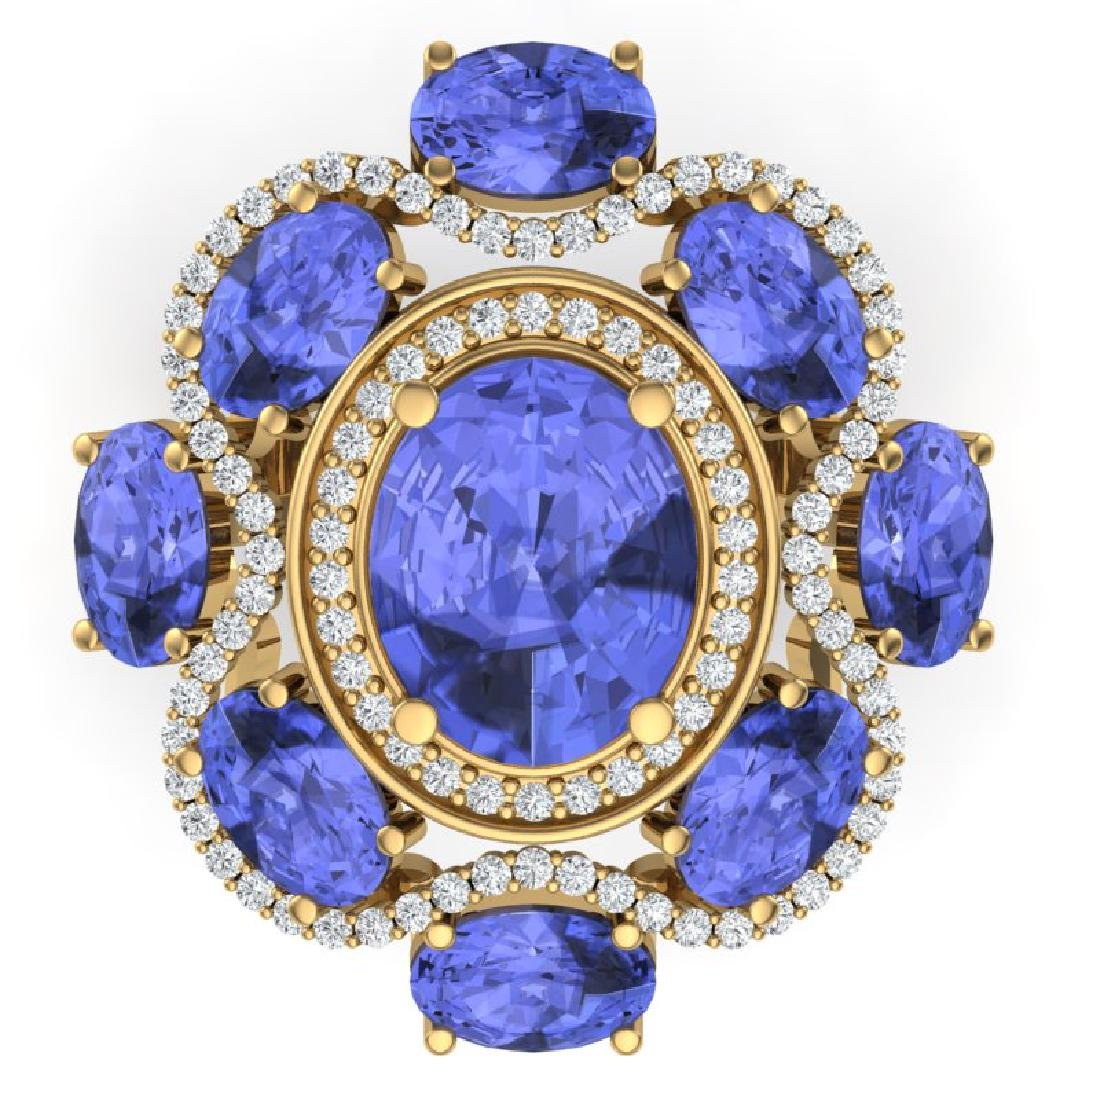 9.67 CTW Royalty Tanzanite & VS Diamond Ring 18K Yellow - 2